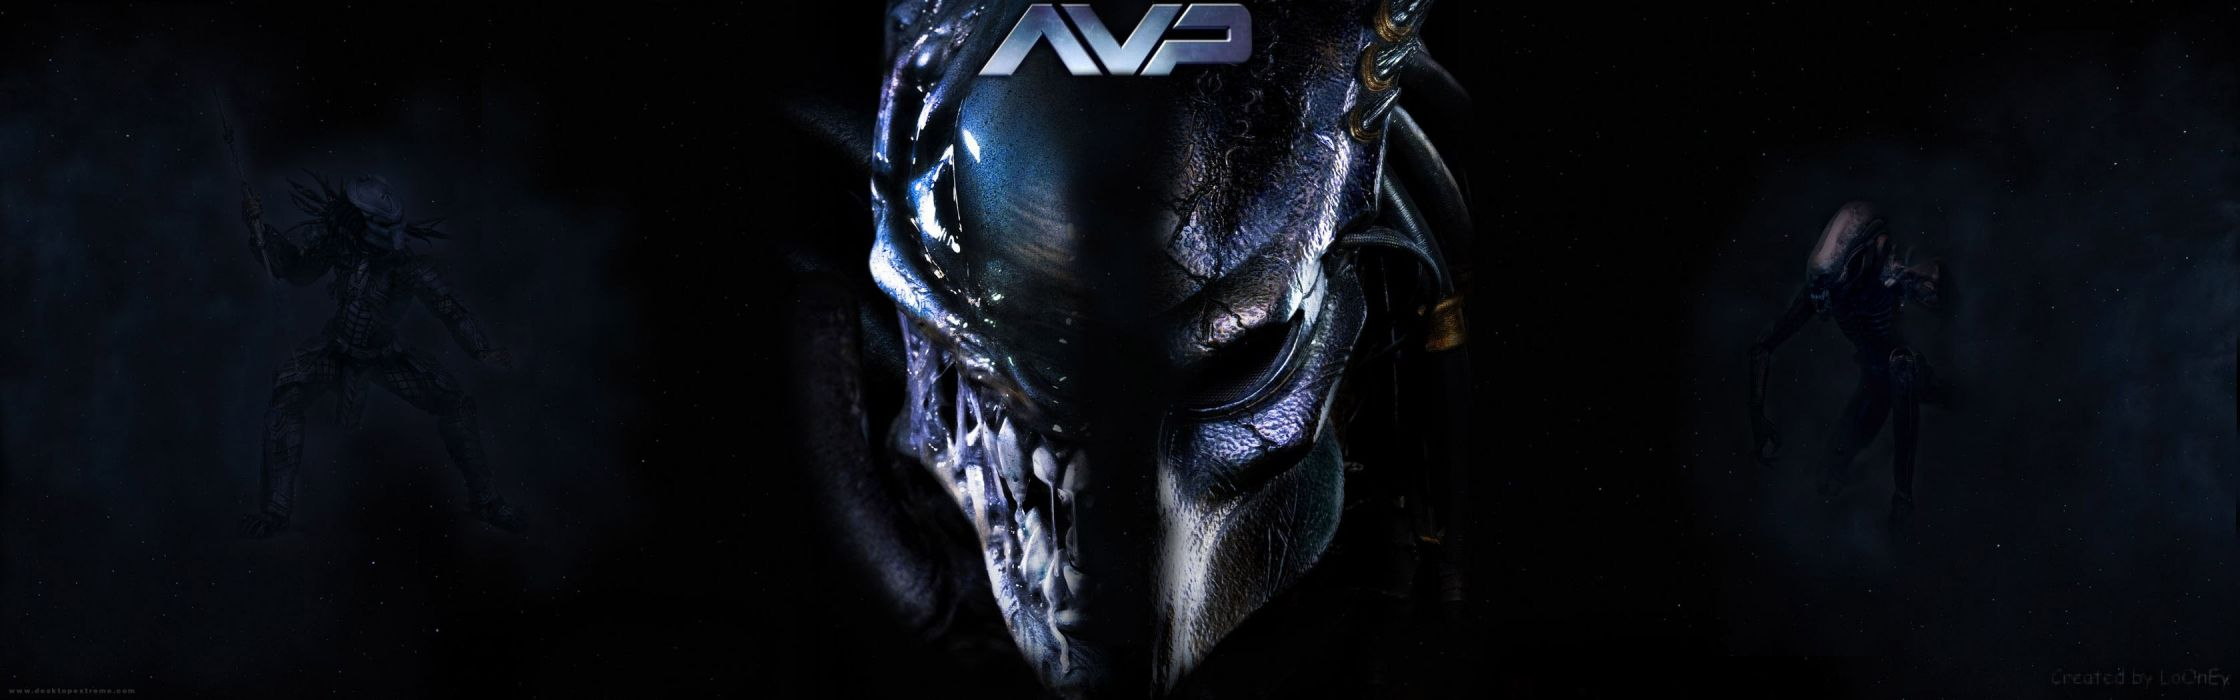 movies predator Aliens vs Predator movie wallpaper